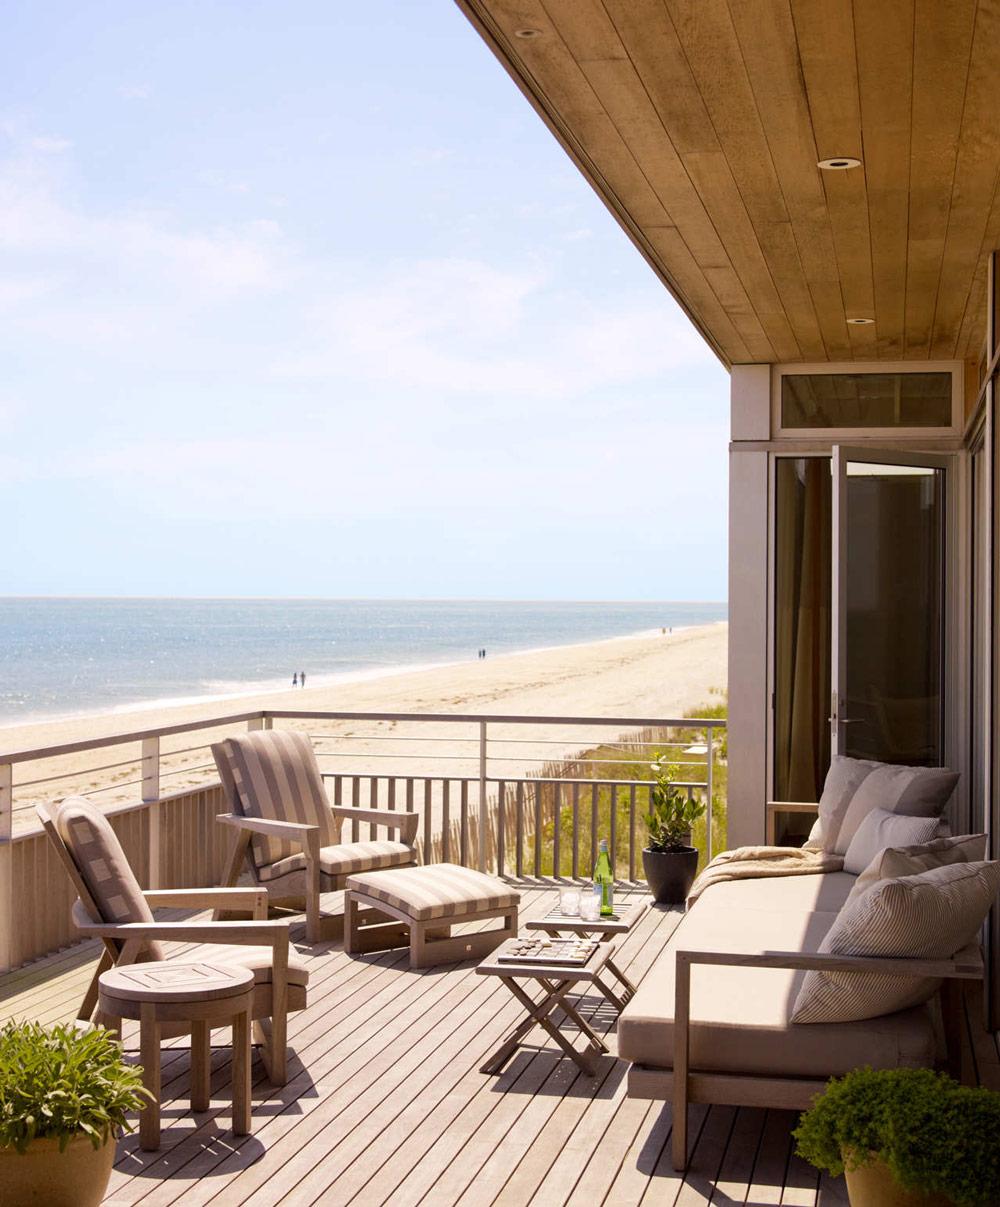 Balcony, Outdoor Living, Surfside House in Bridgehampton, New York by Stelle Architects